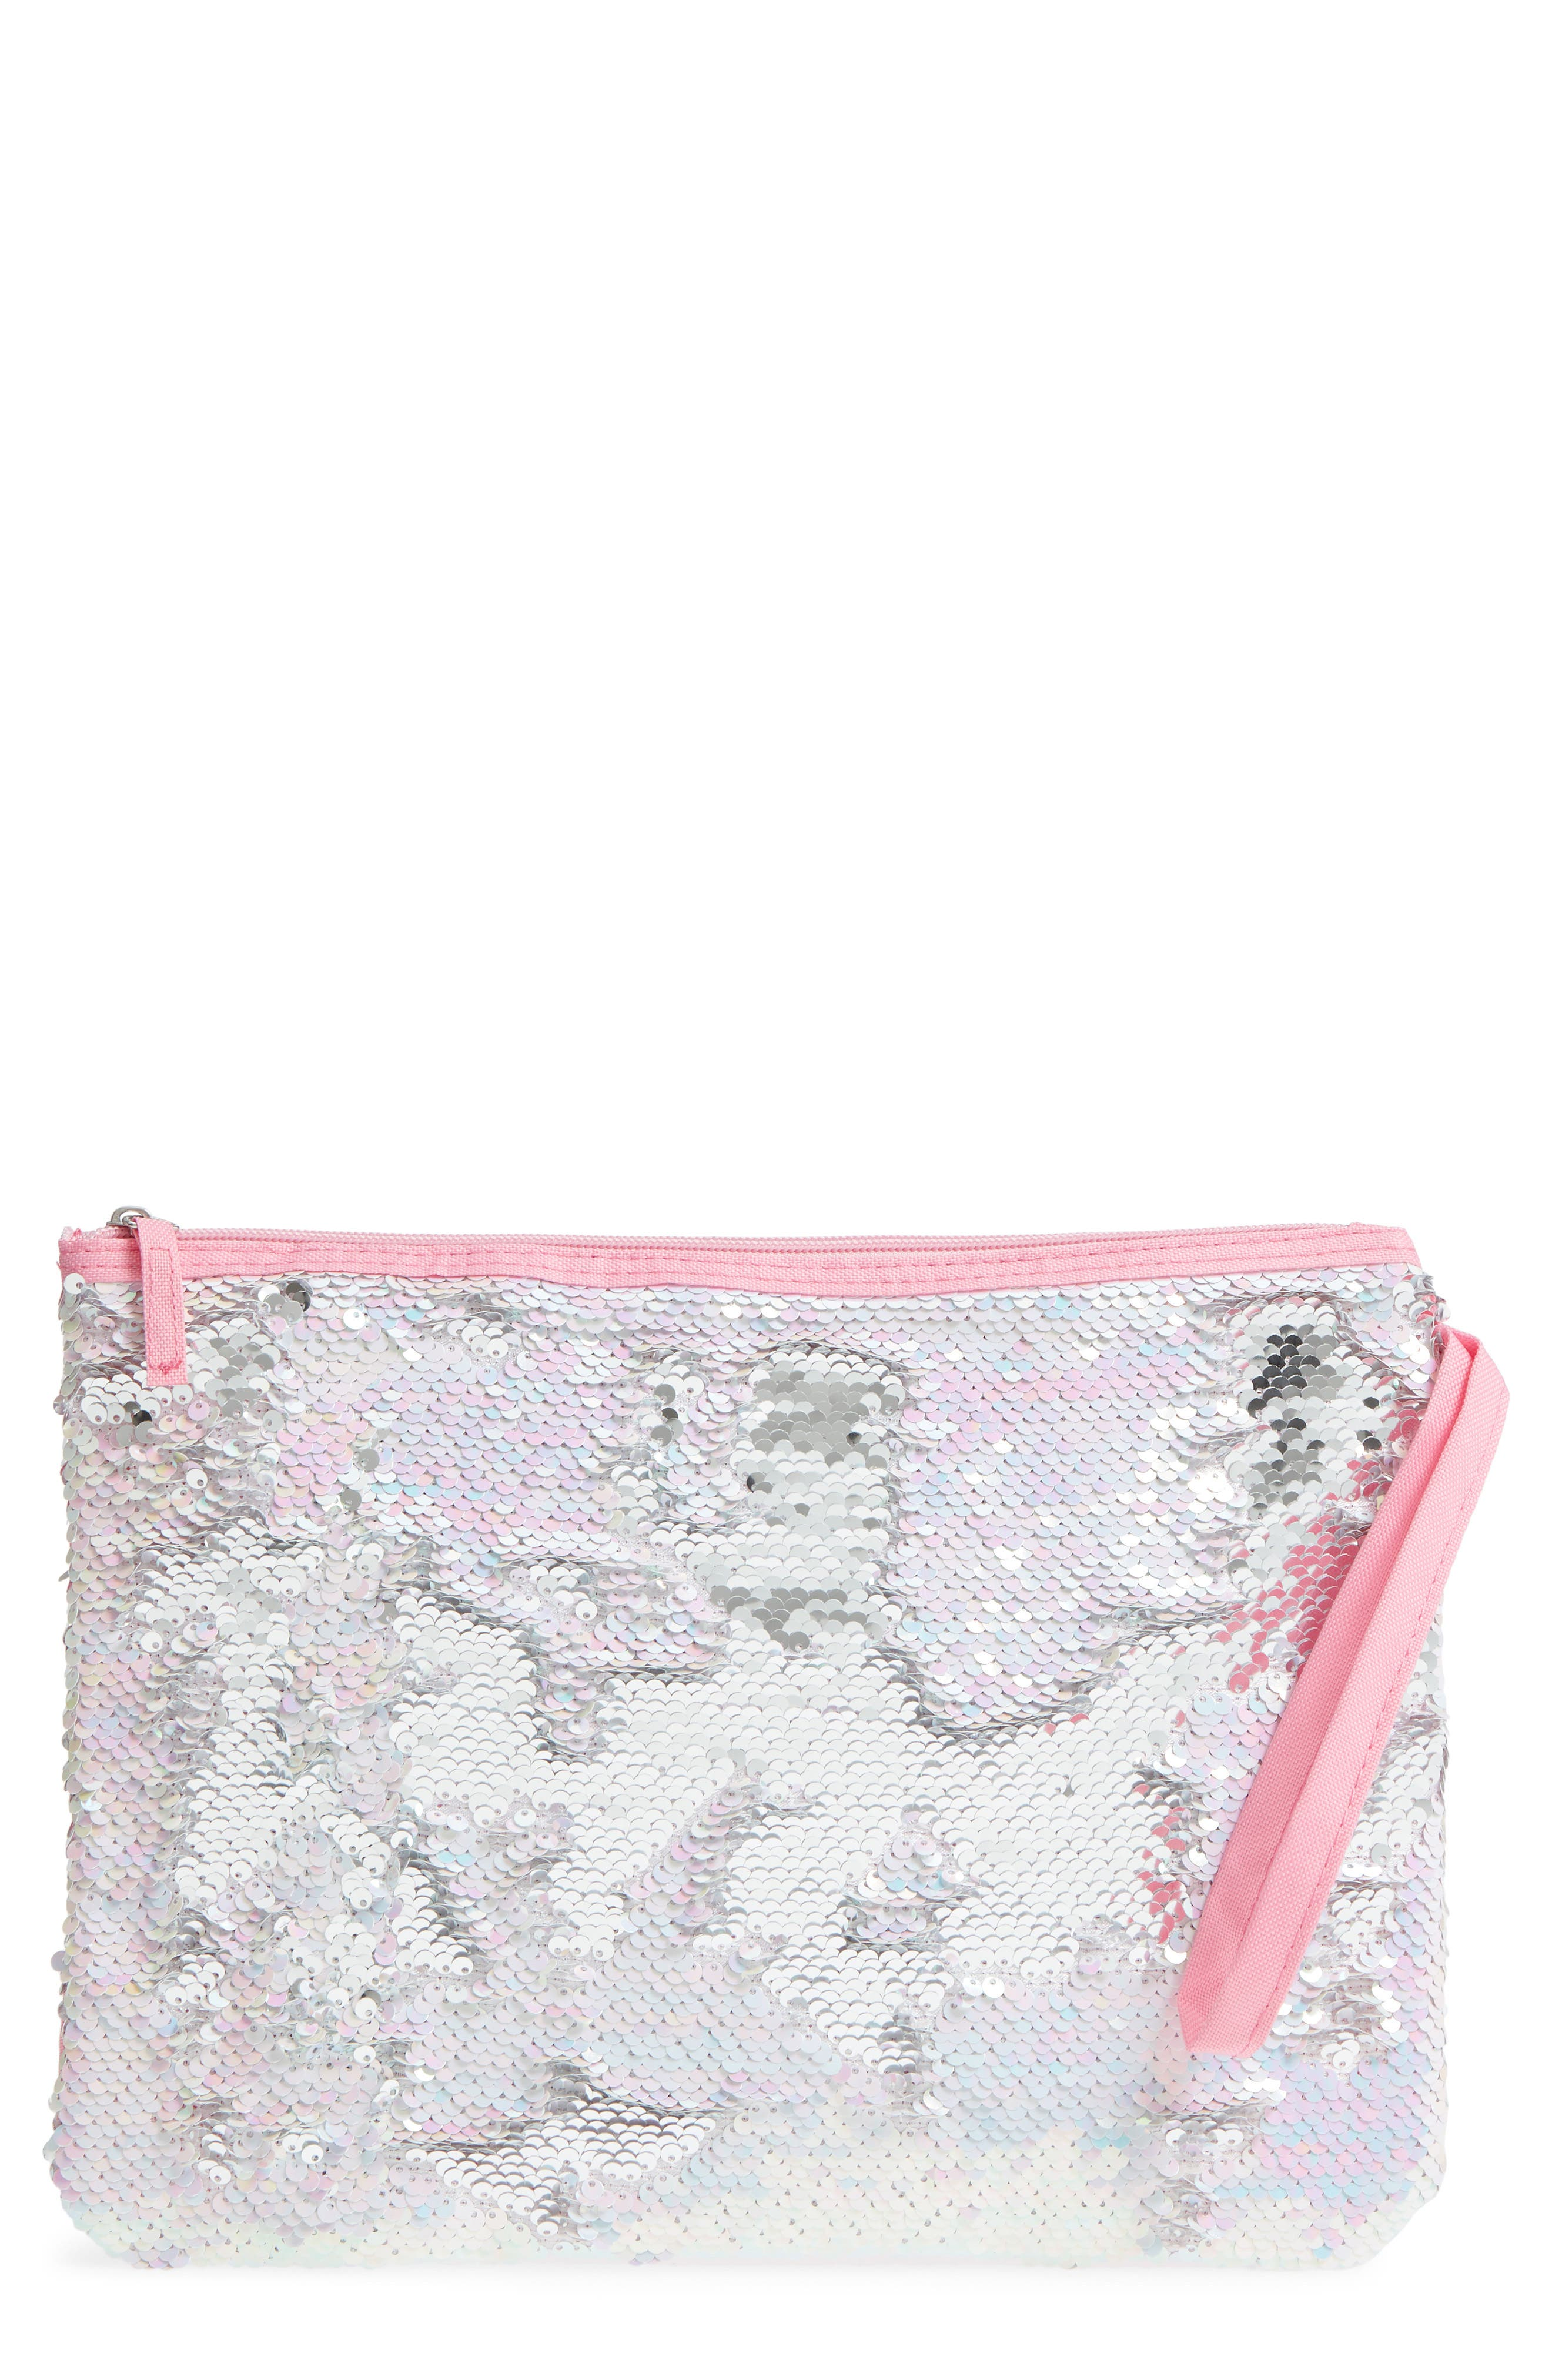 Sequin Bikini Bag,                             Main thumbnail 1, color,                             650